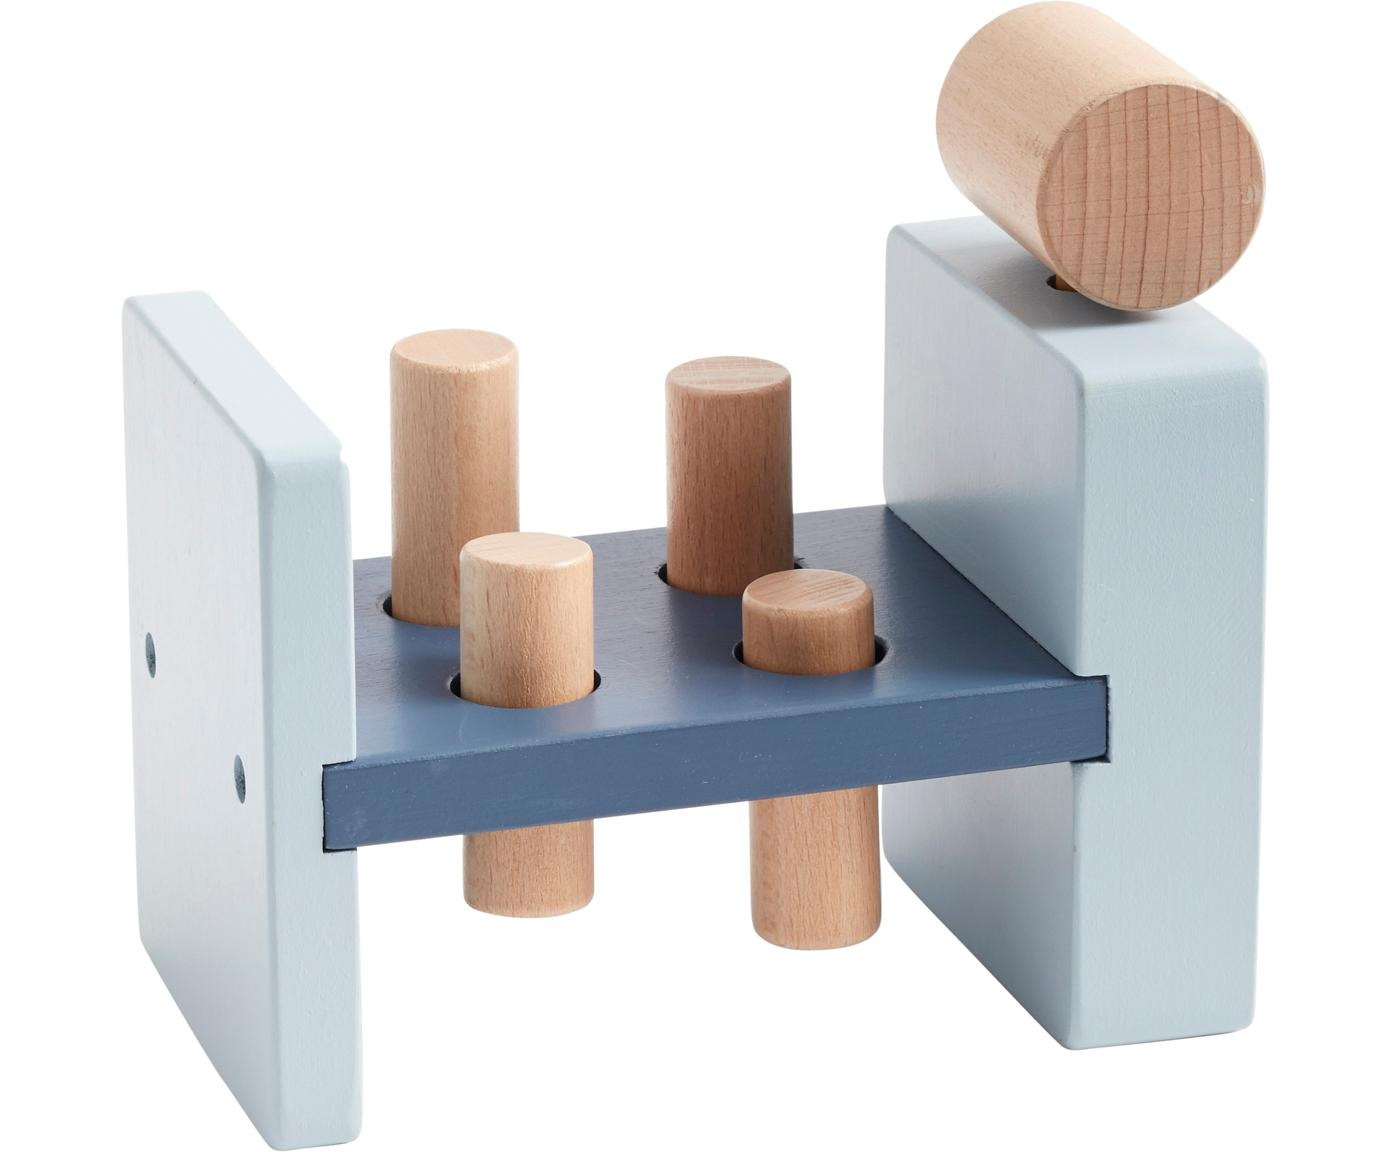 Spielzeug-Set Aiden, Holz, Blau, Holz, 19 x 10 cm